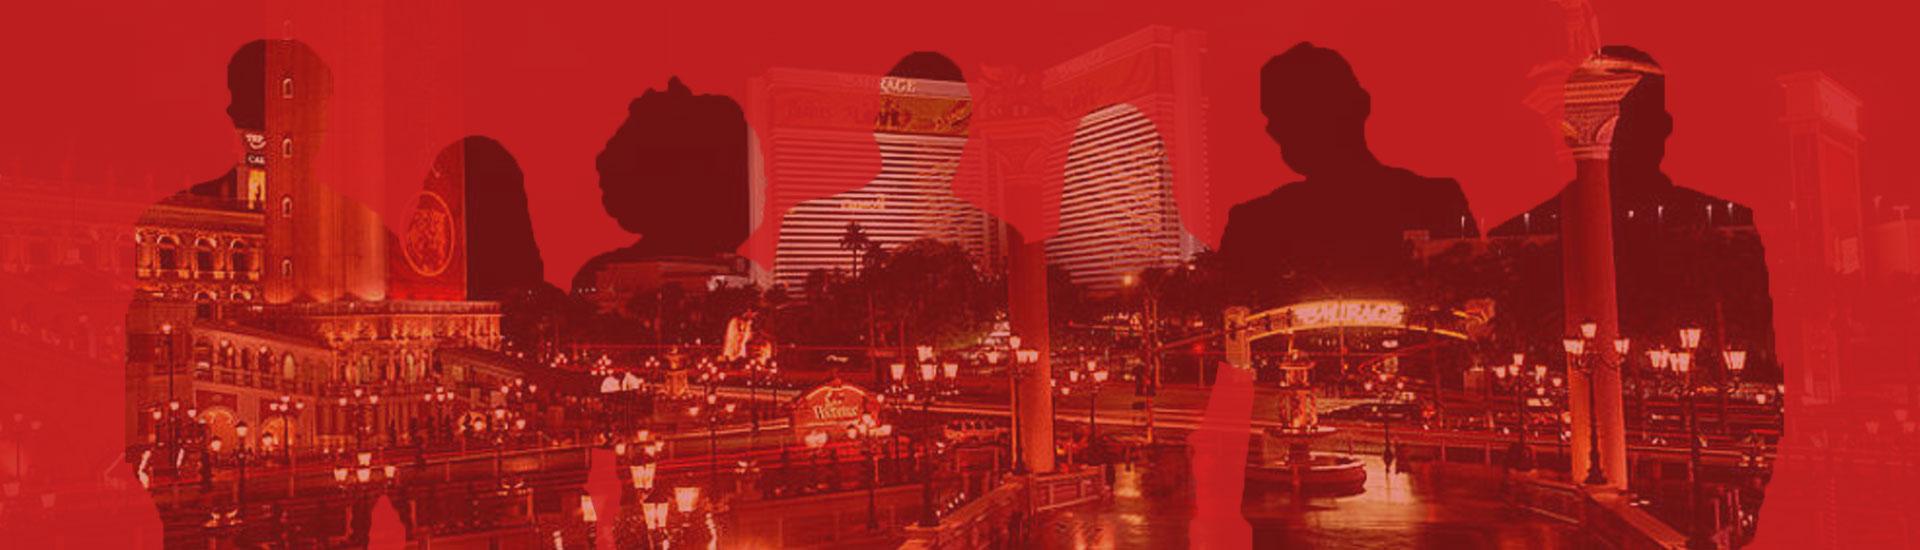 Digital Dealer Las Vegas 2021 - CF Search Marketing